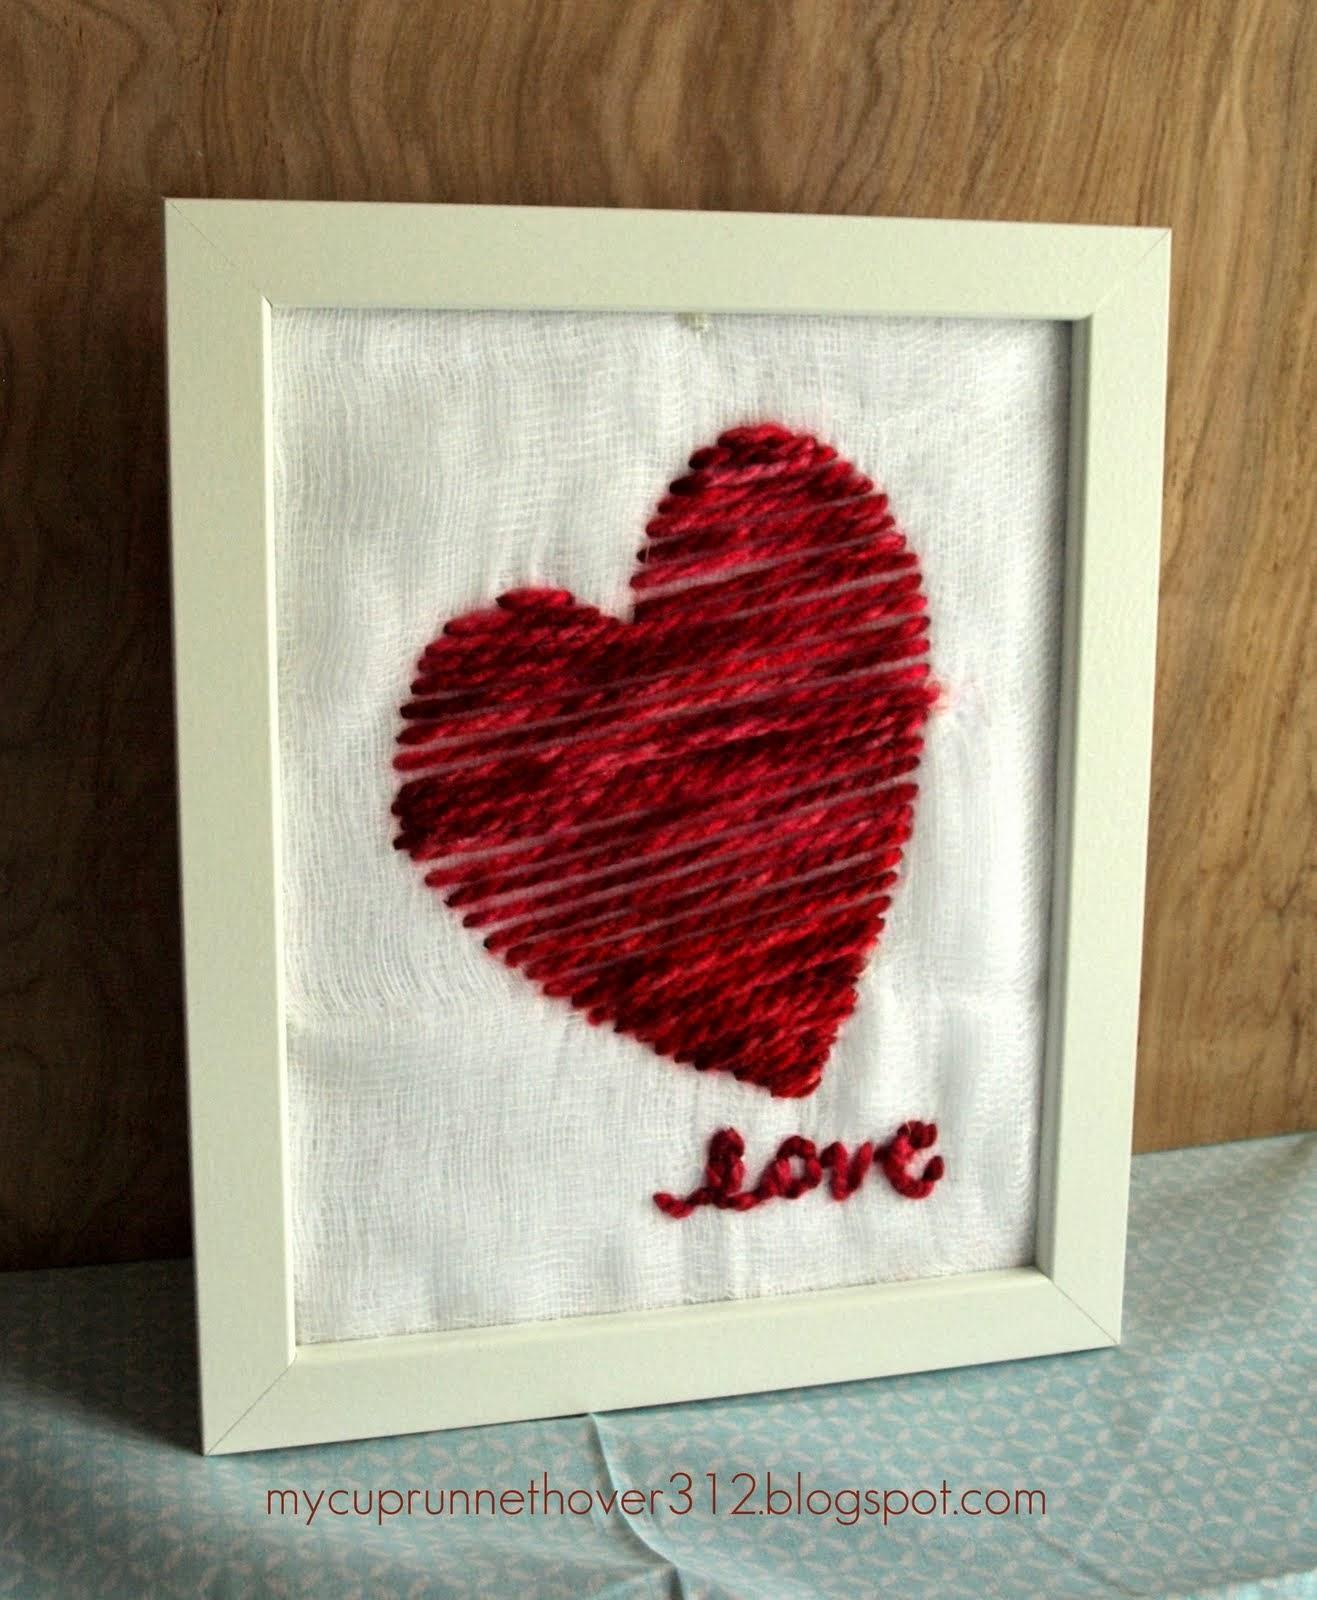 http://mycuprunnethover312.blogspot.com/2014/01/valentines-day-yarn-art.html